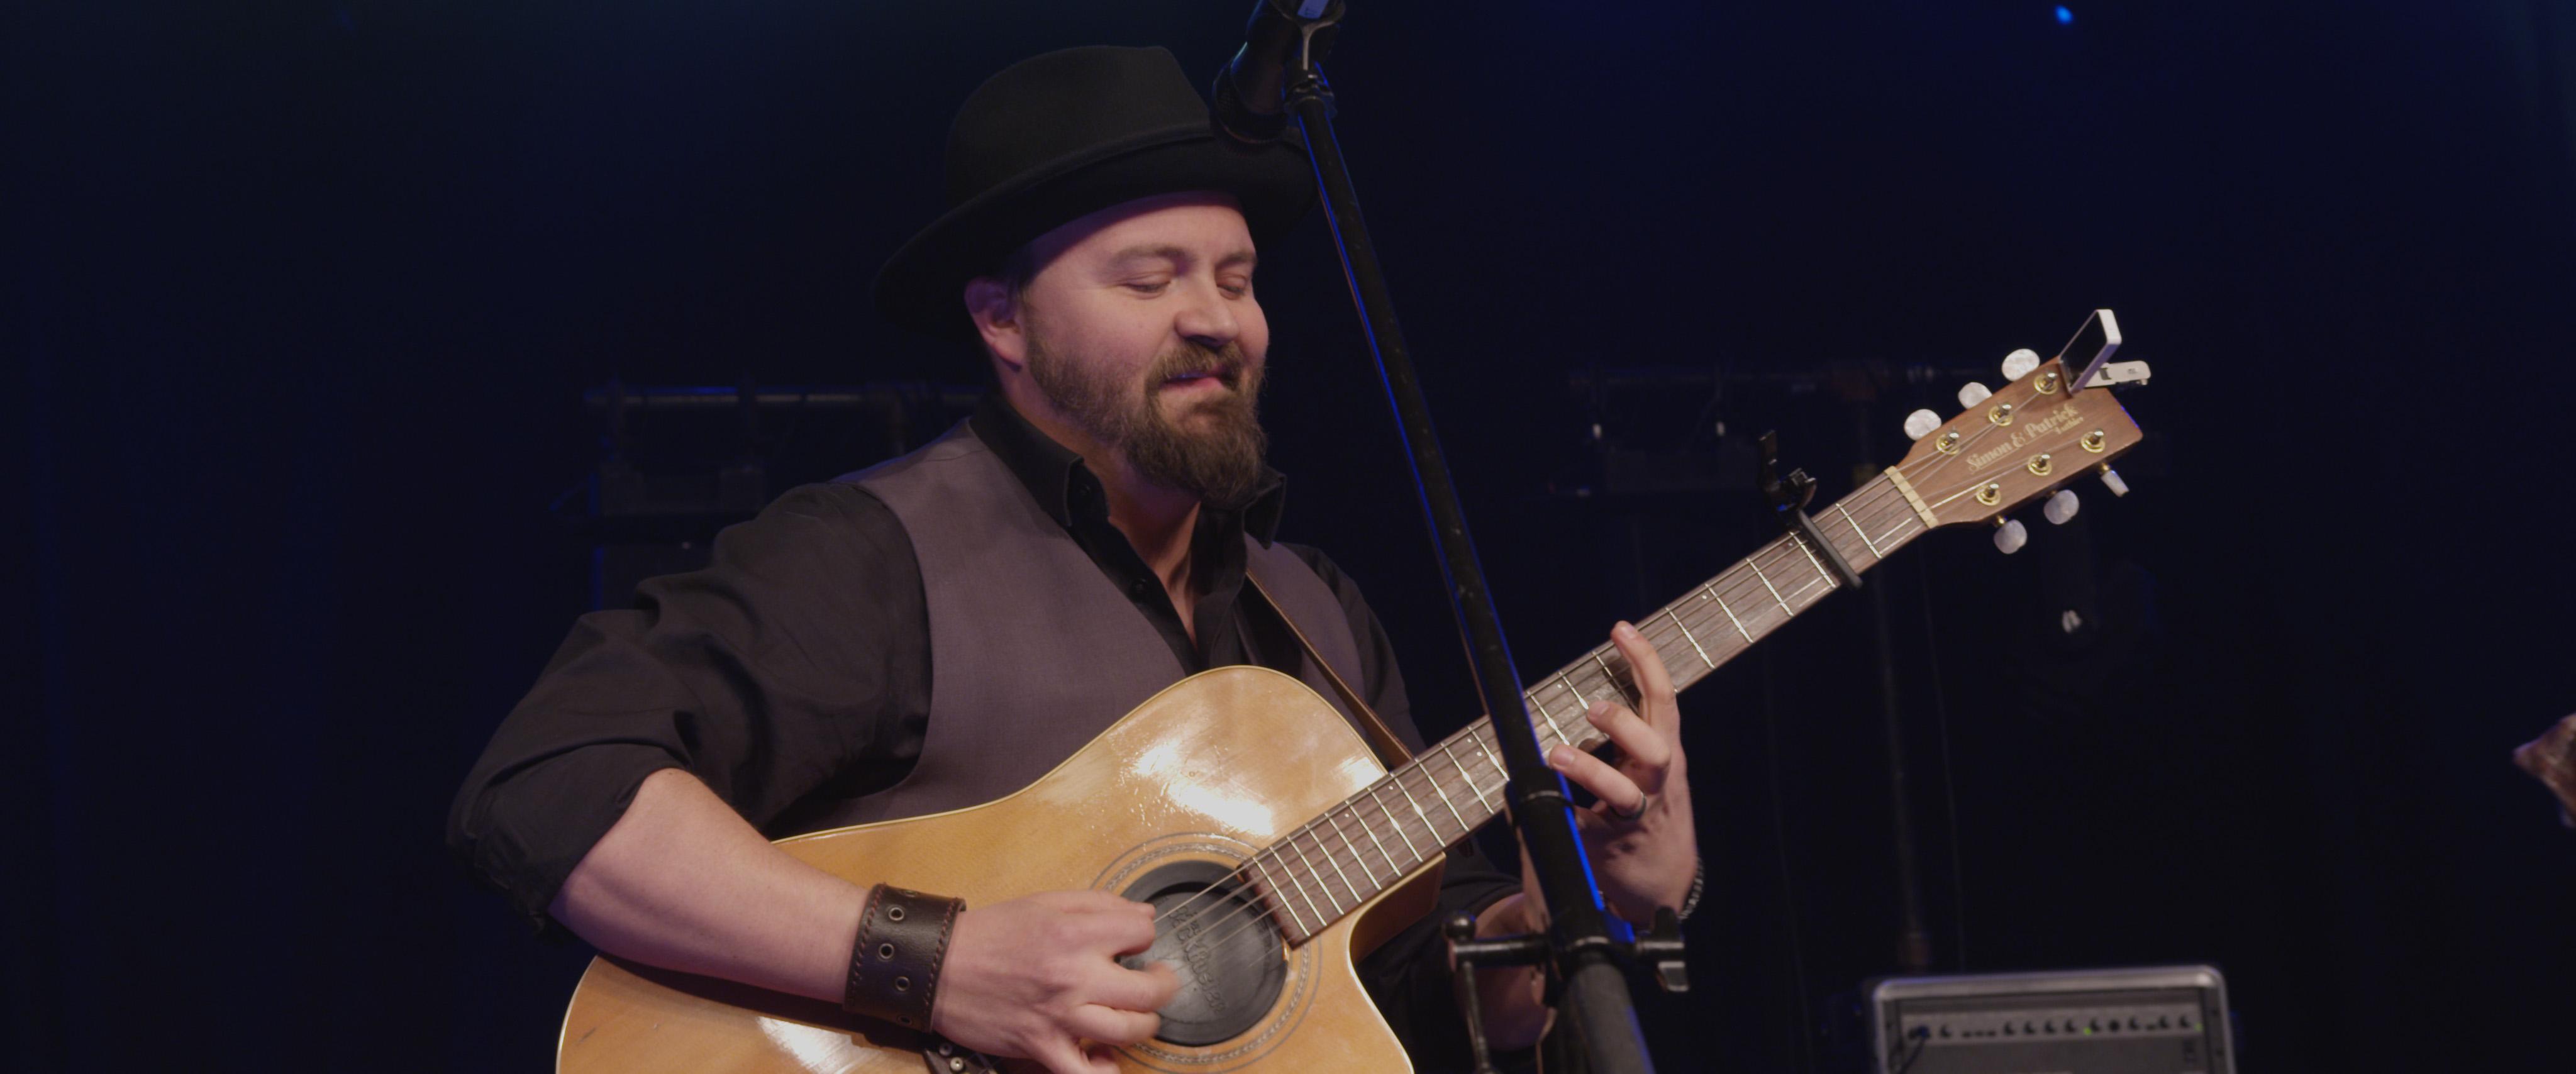 Blake Reid Band - 2017 ACMA's 20